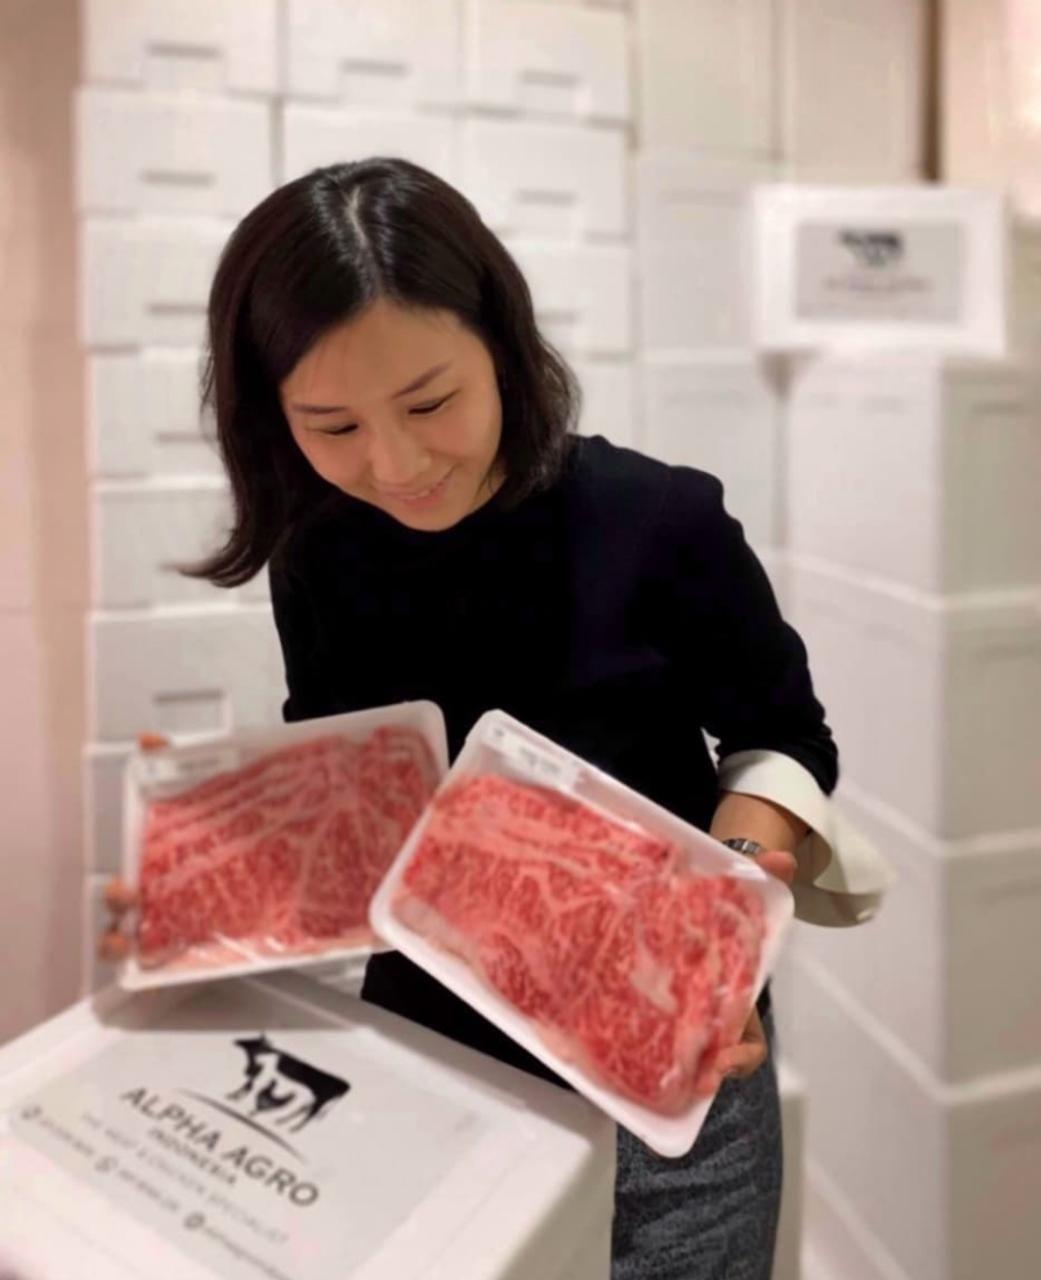 Bisnis kuliner Veronica Tan